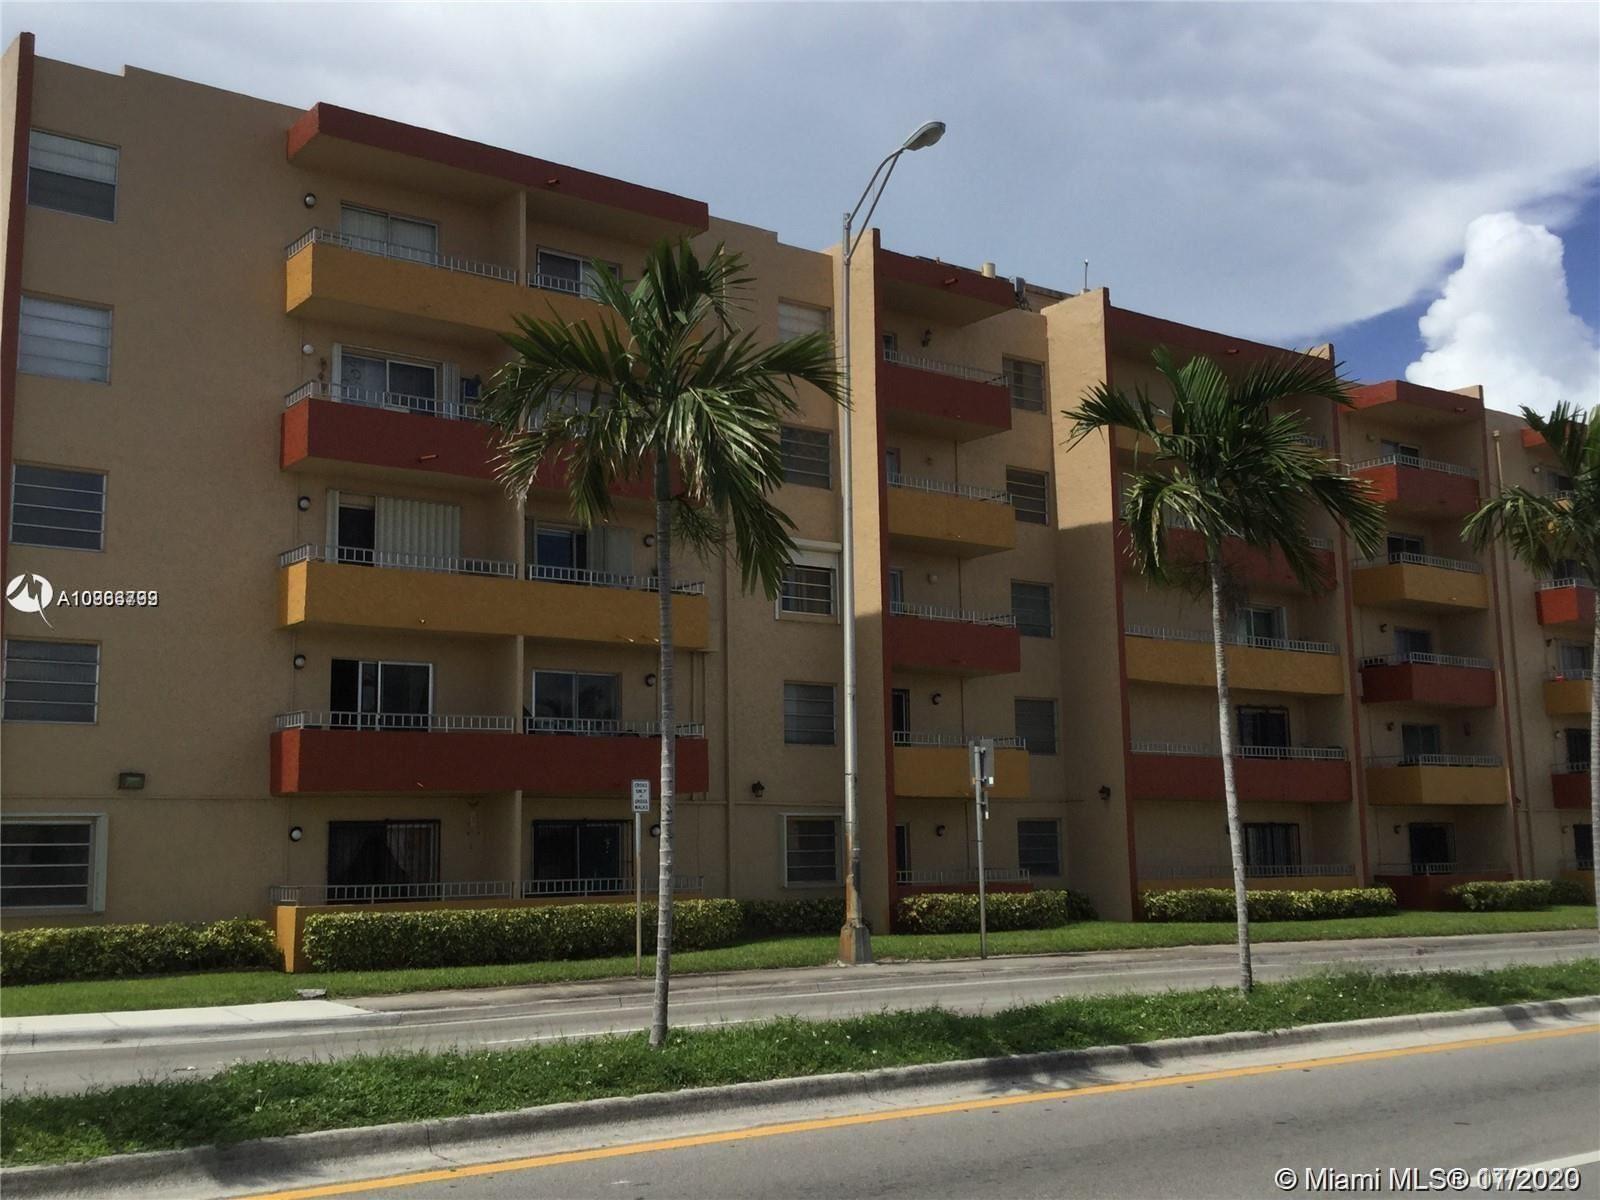 6090 W Flagler St #103, Miami, FL 33144 - #: A10963799